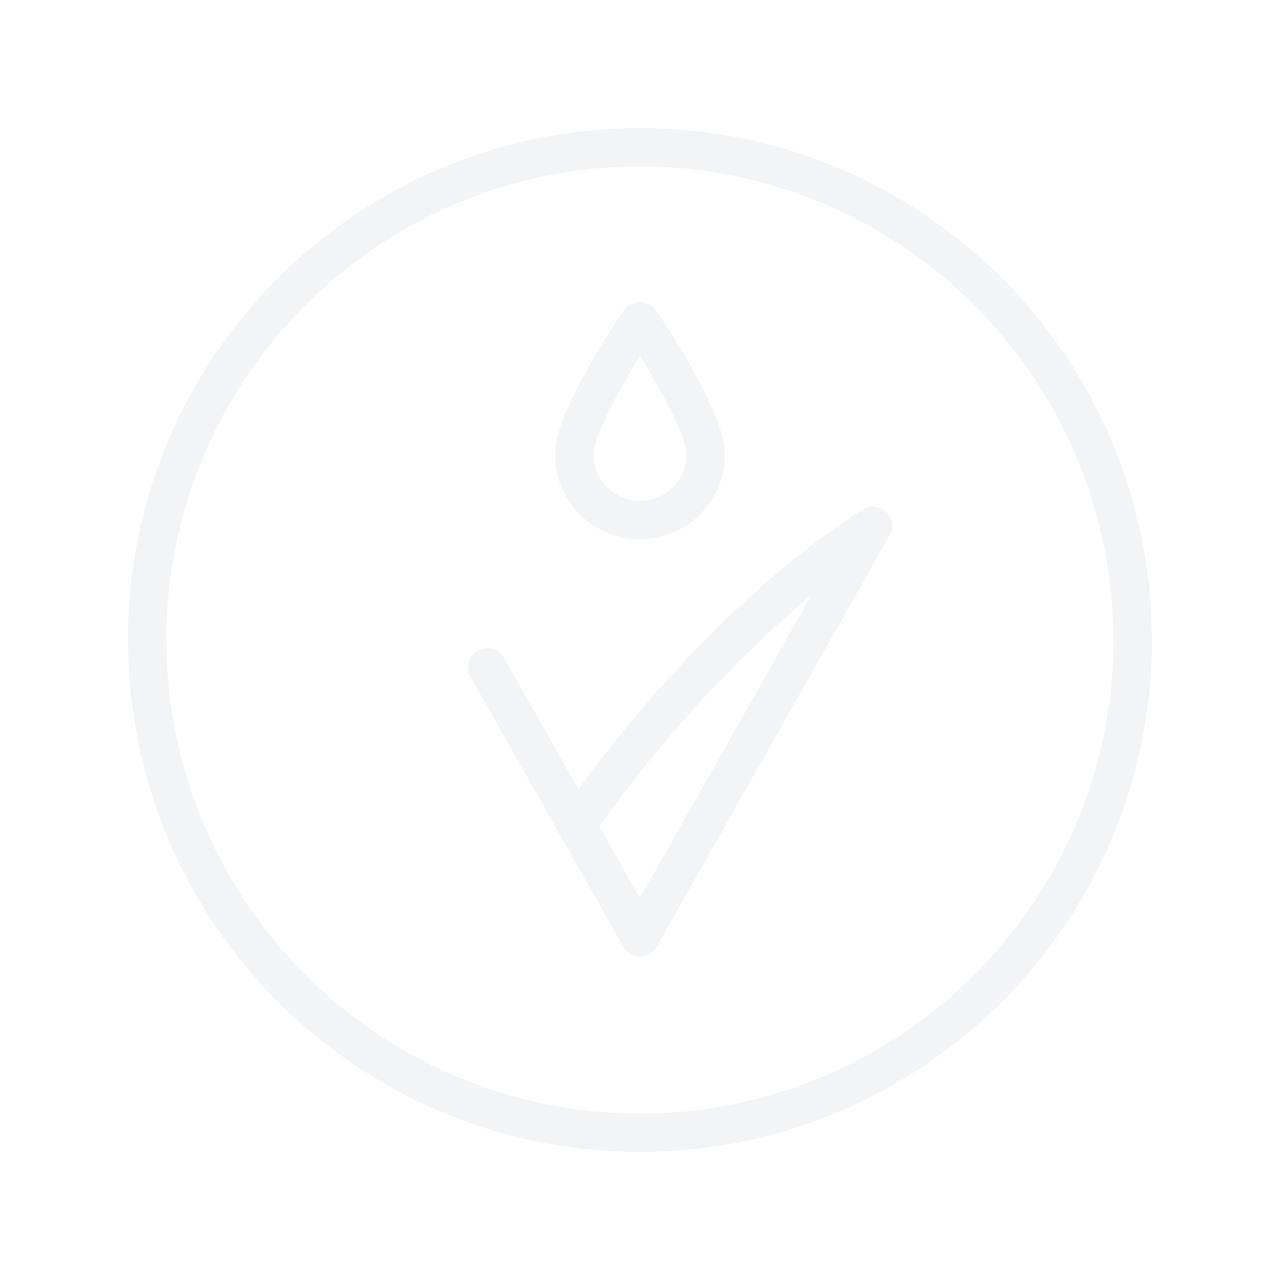 KERASTASE Discipline Cleansing Conditioner 400ml